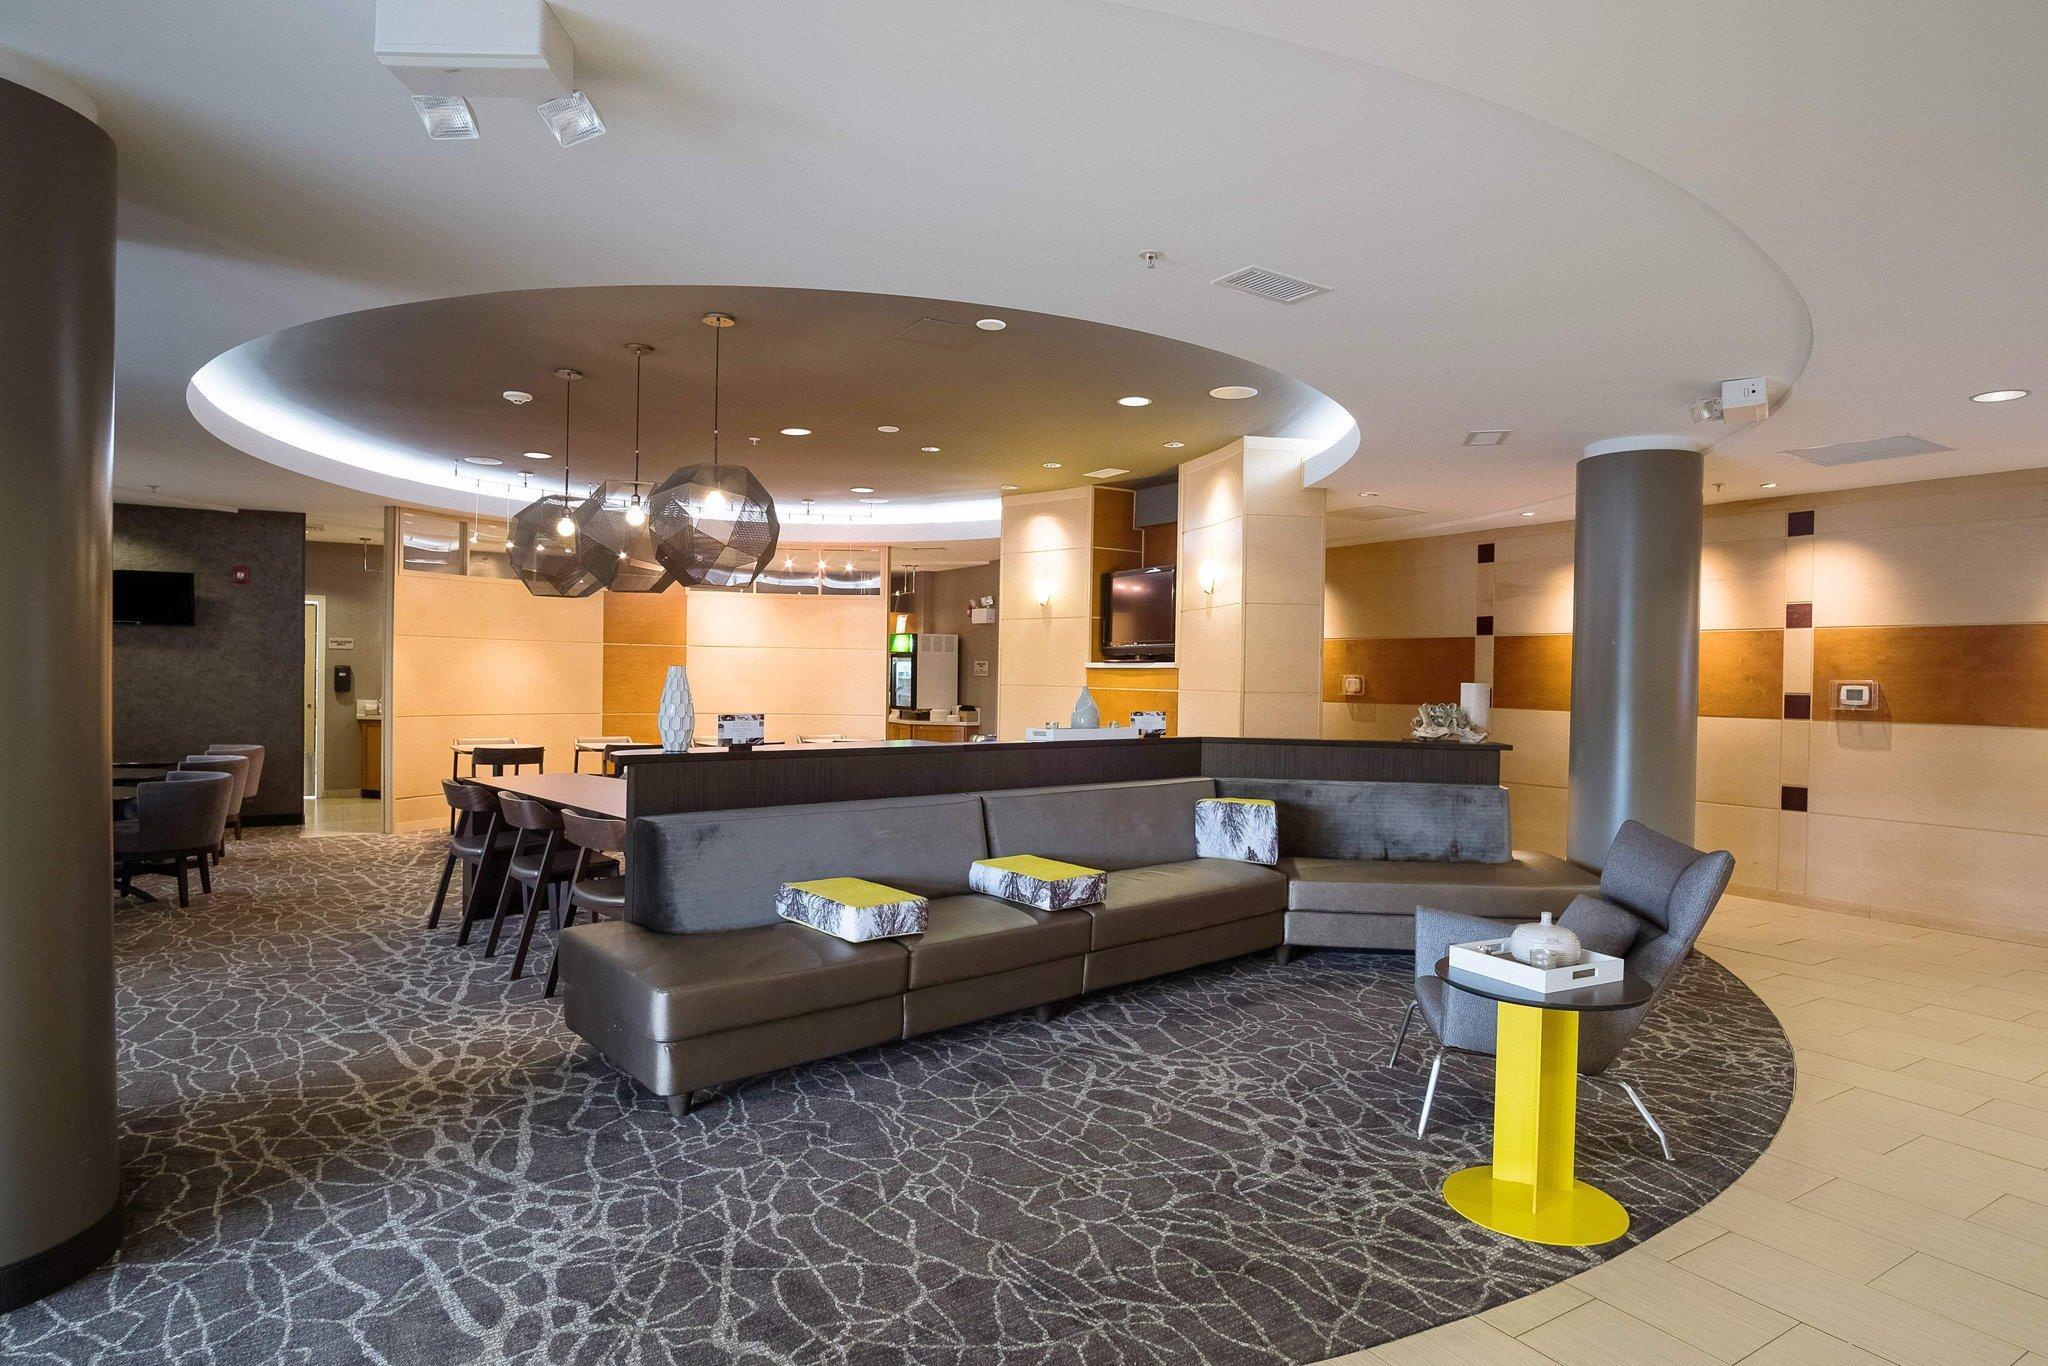 SpringHill Suites Winston Salem Hanes Mall